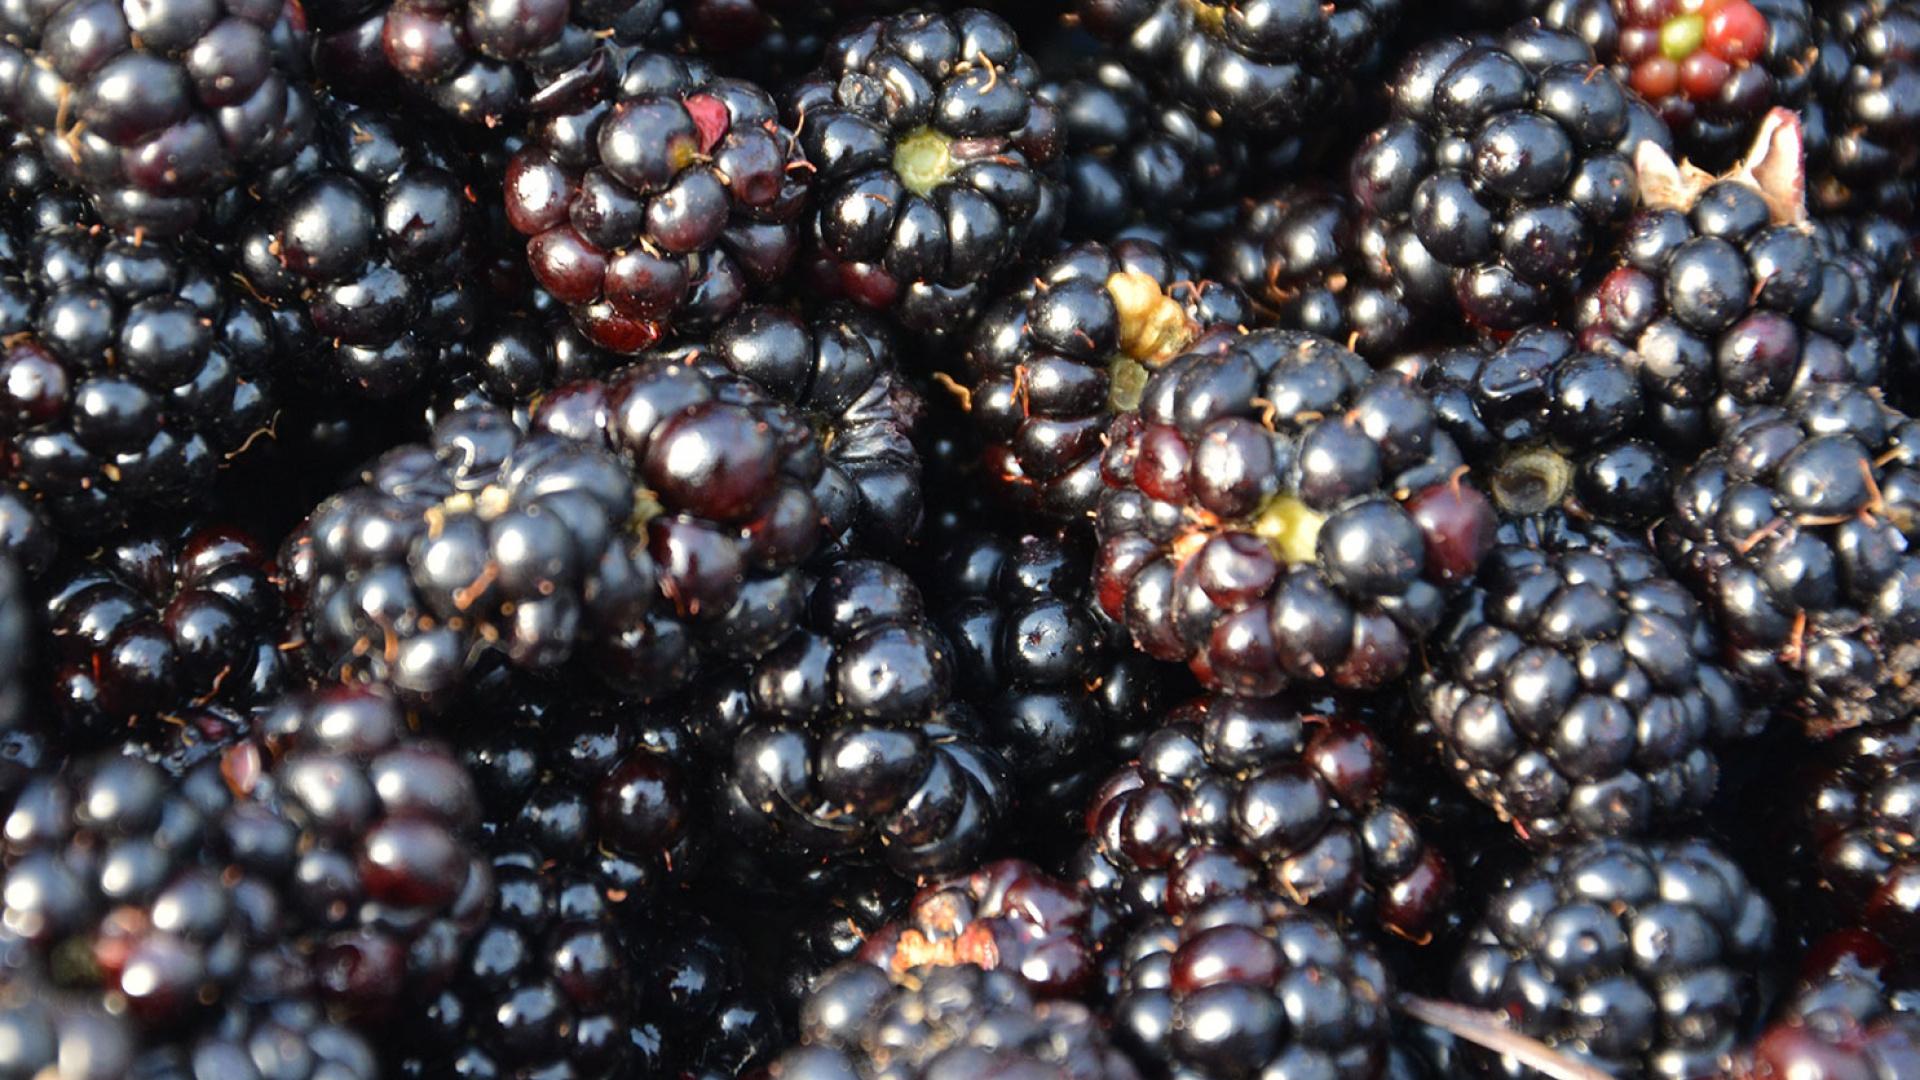 Blackberries at the Eden Project